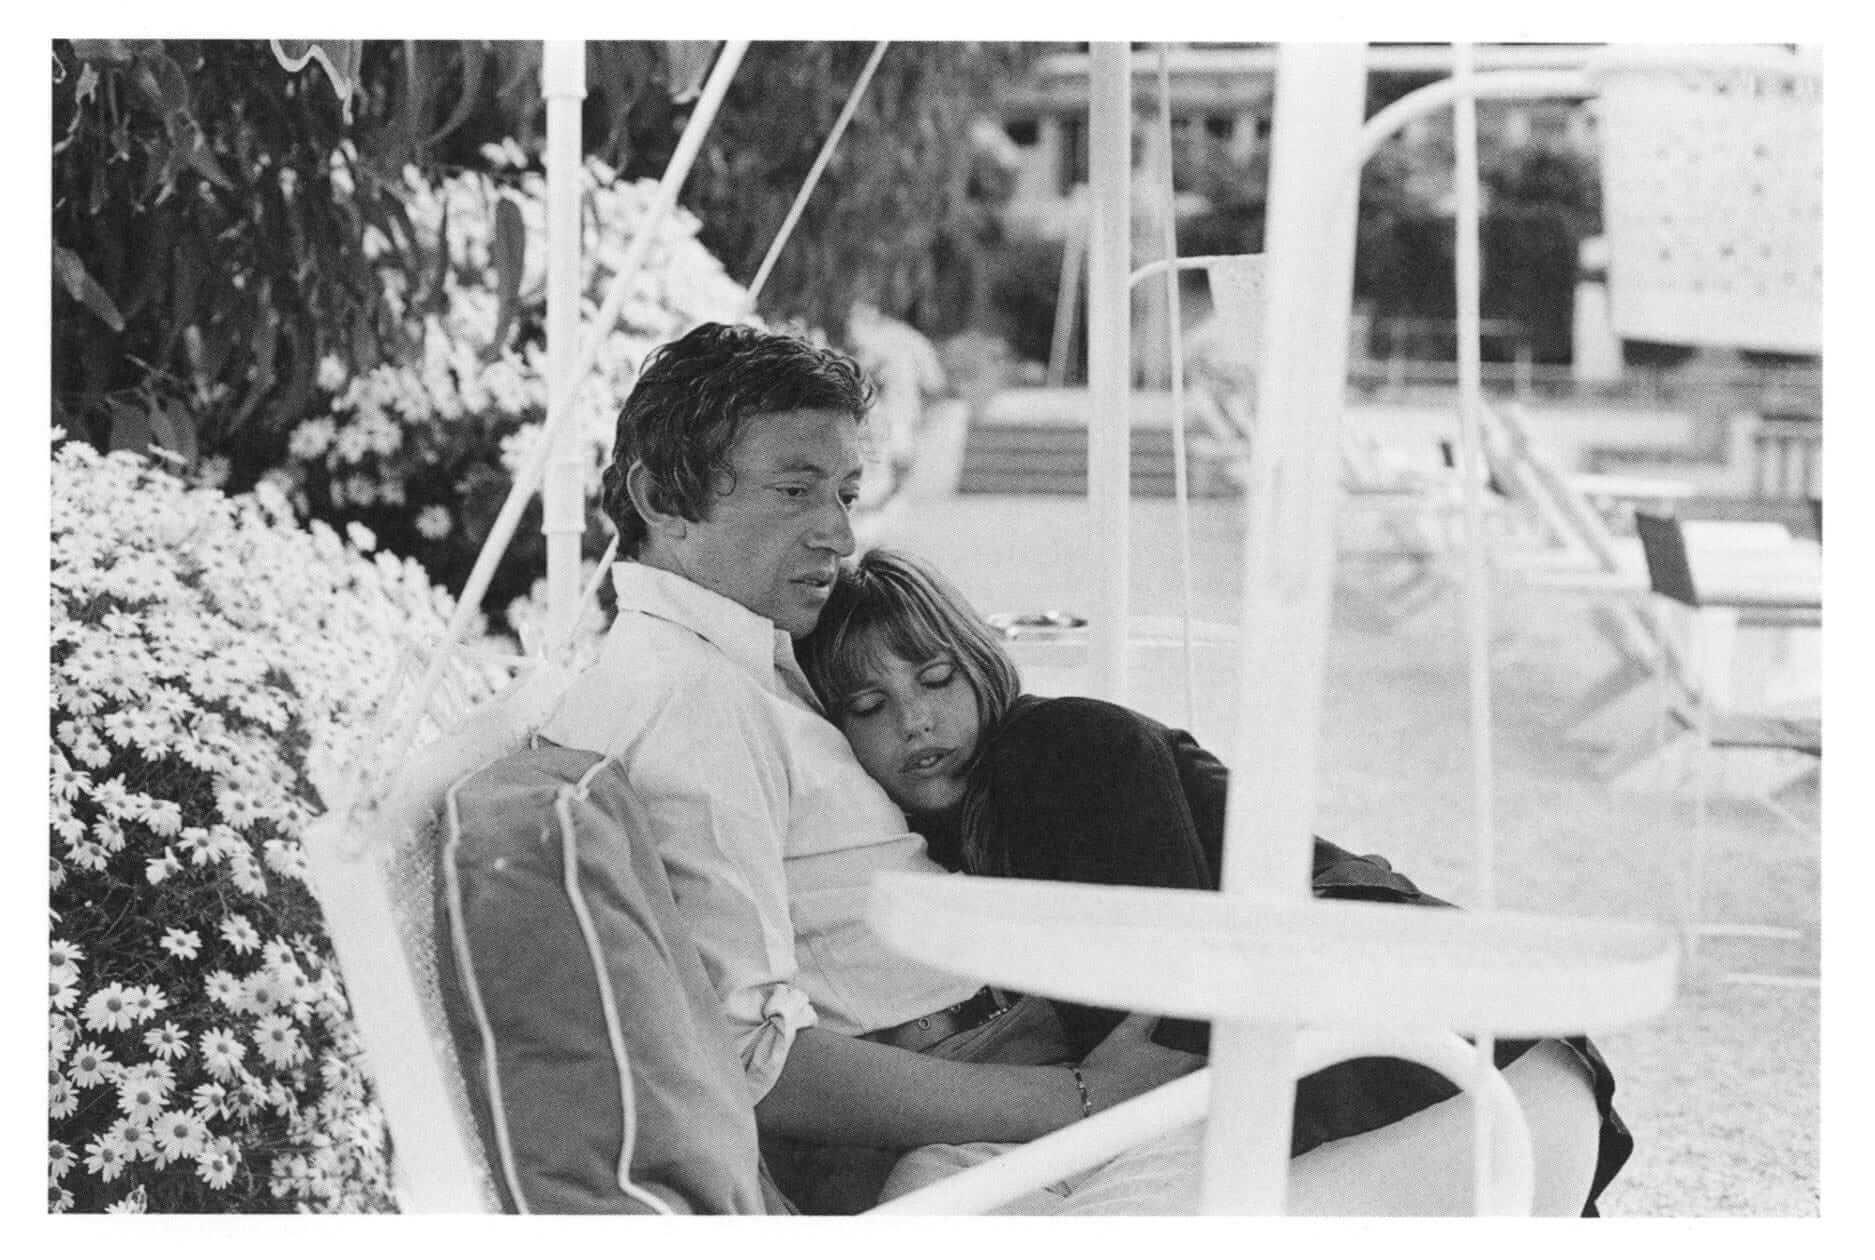 Серж Генсбур и Джейн Биркин в 1969 году. Фото: Andrew Birkin